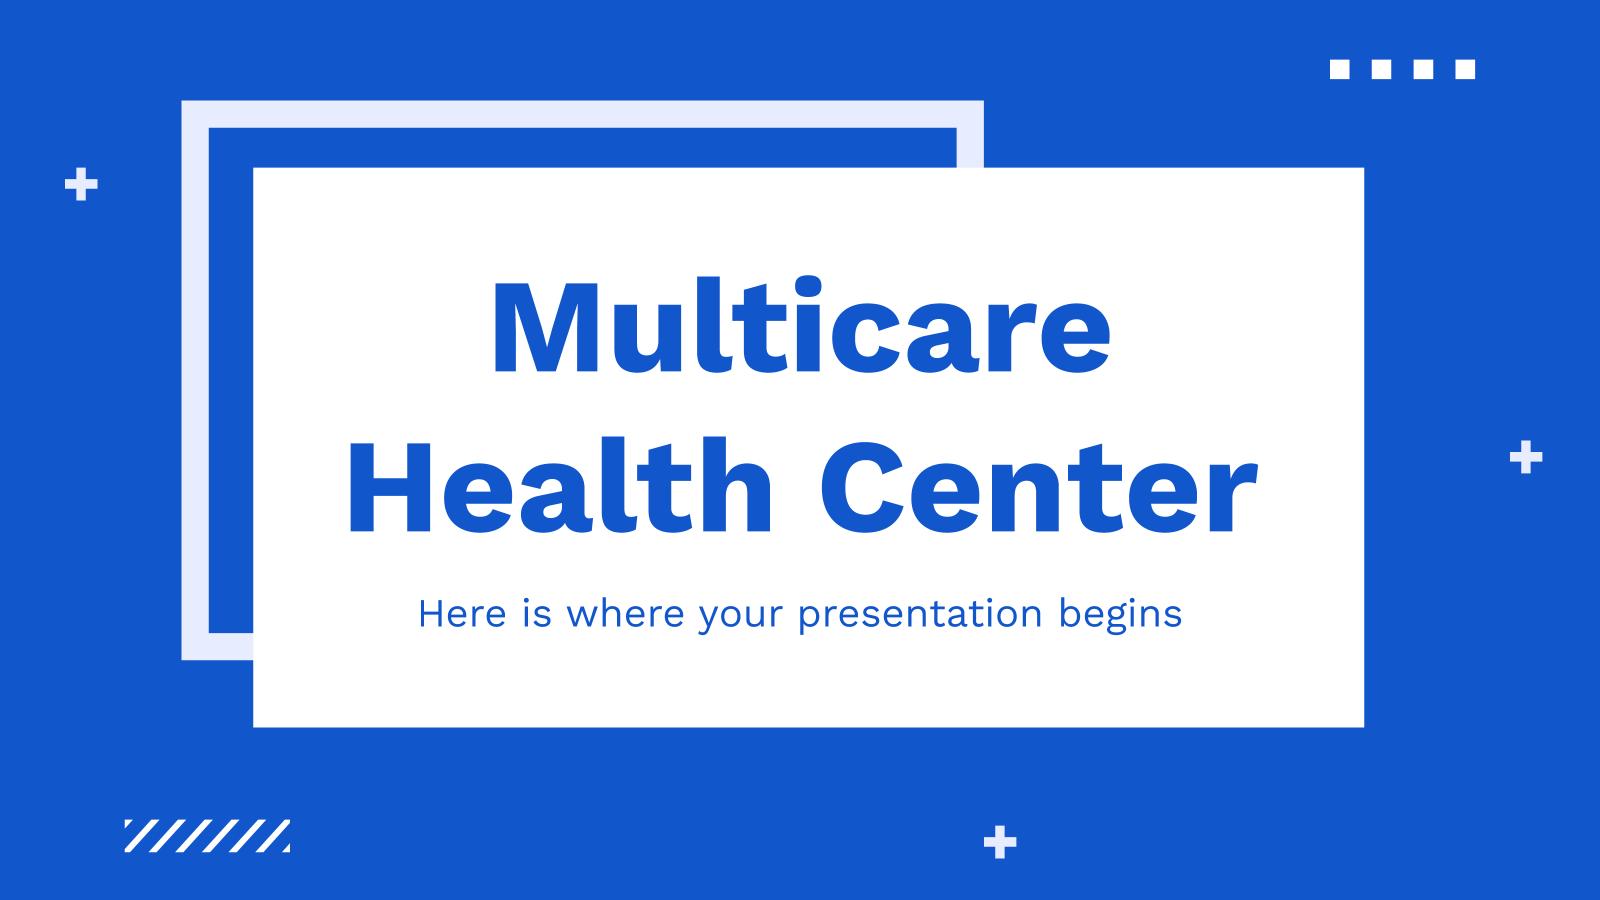 Multicare health center presentation template